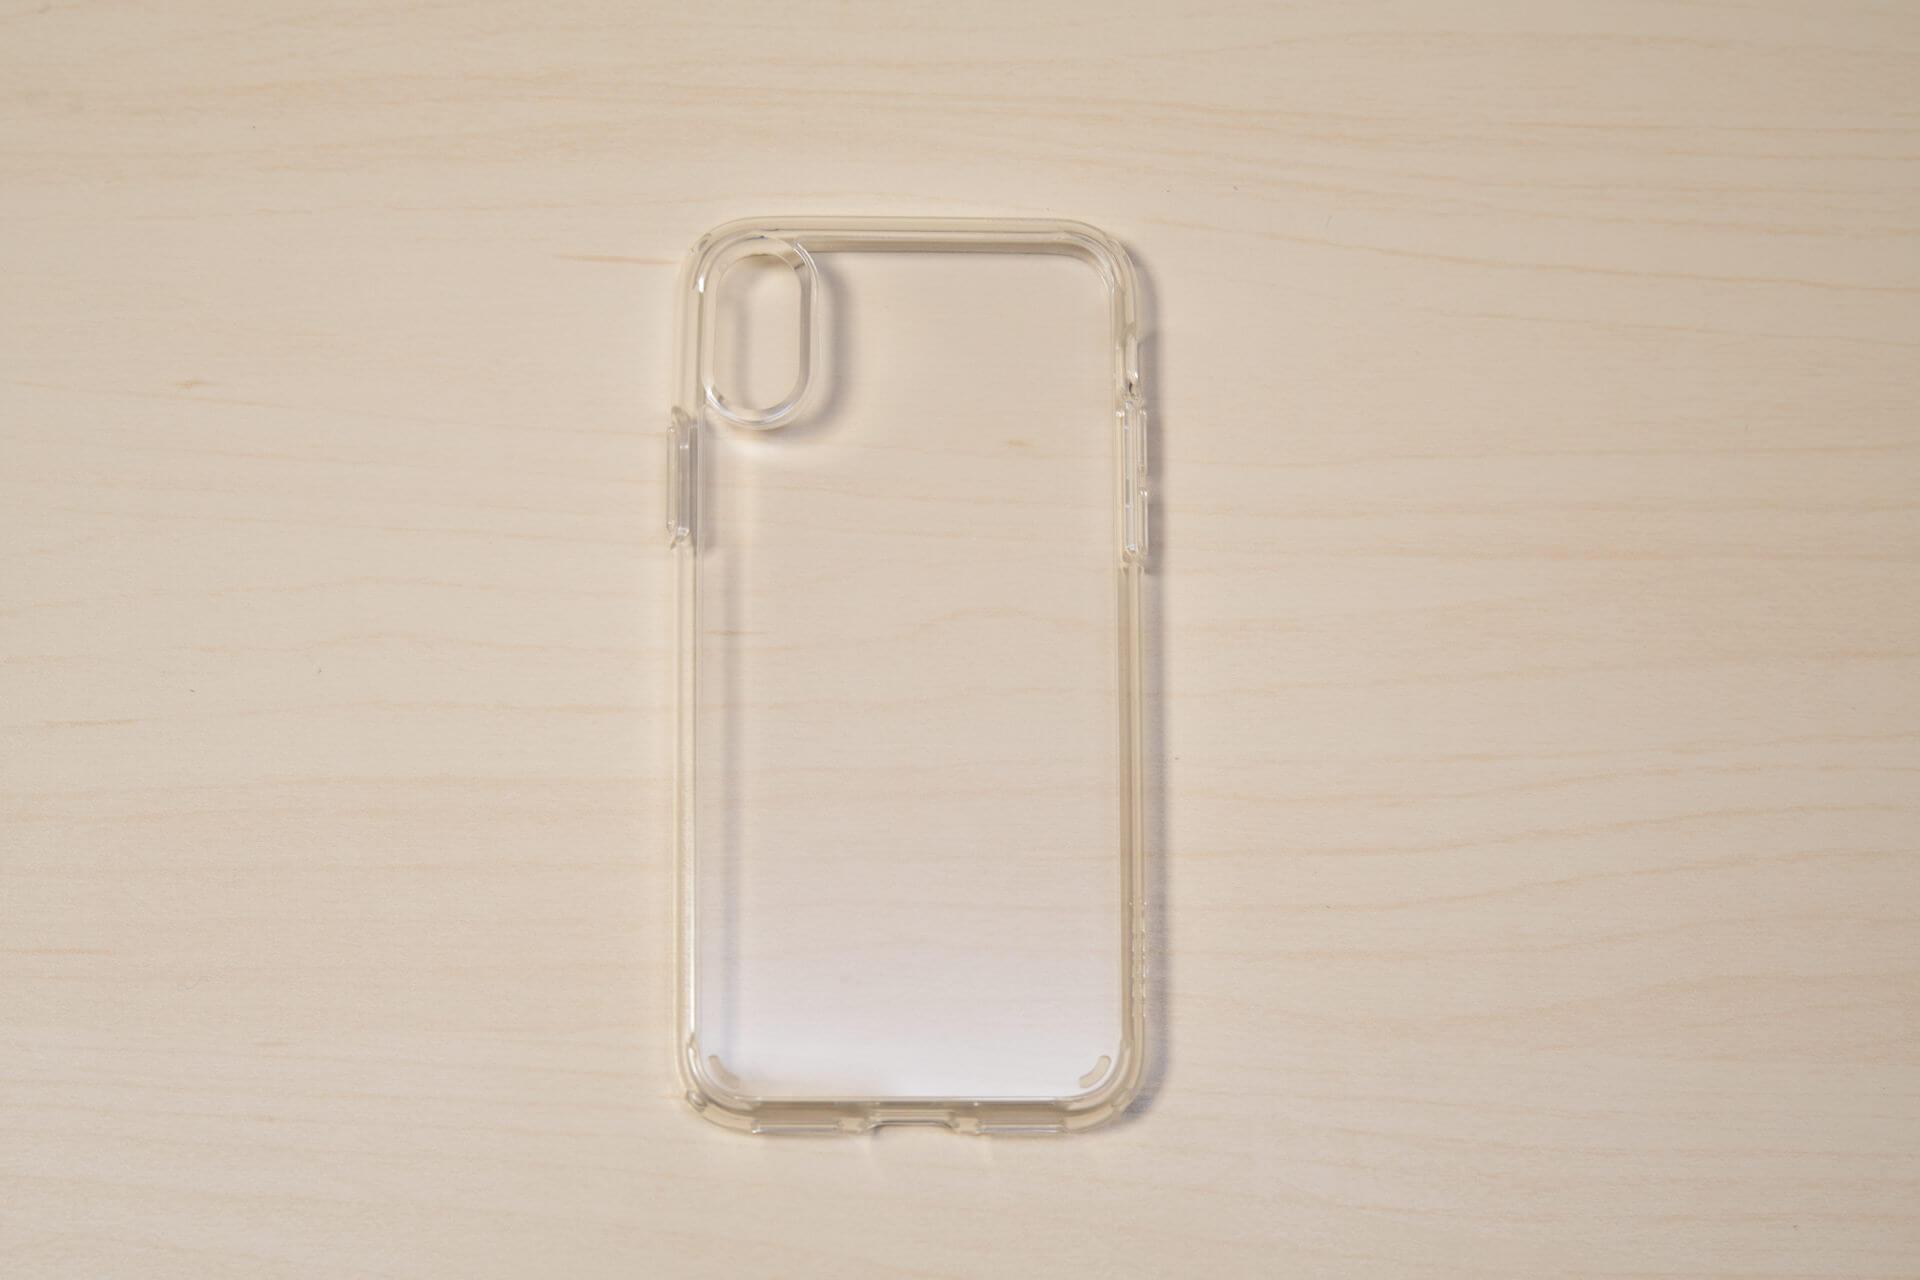 Spigen iPhone X ケース ウルトラ・ハイブリッド 3